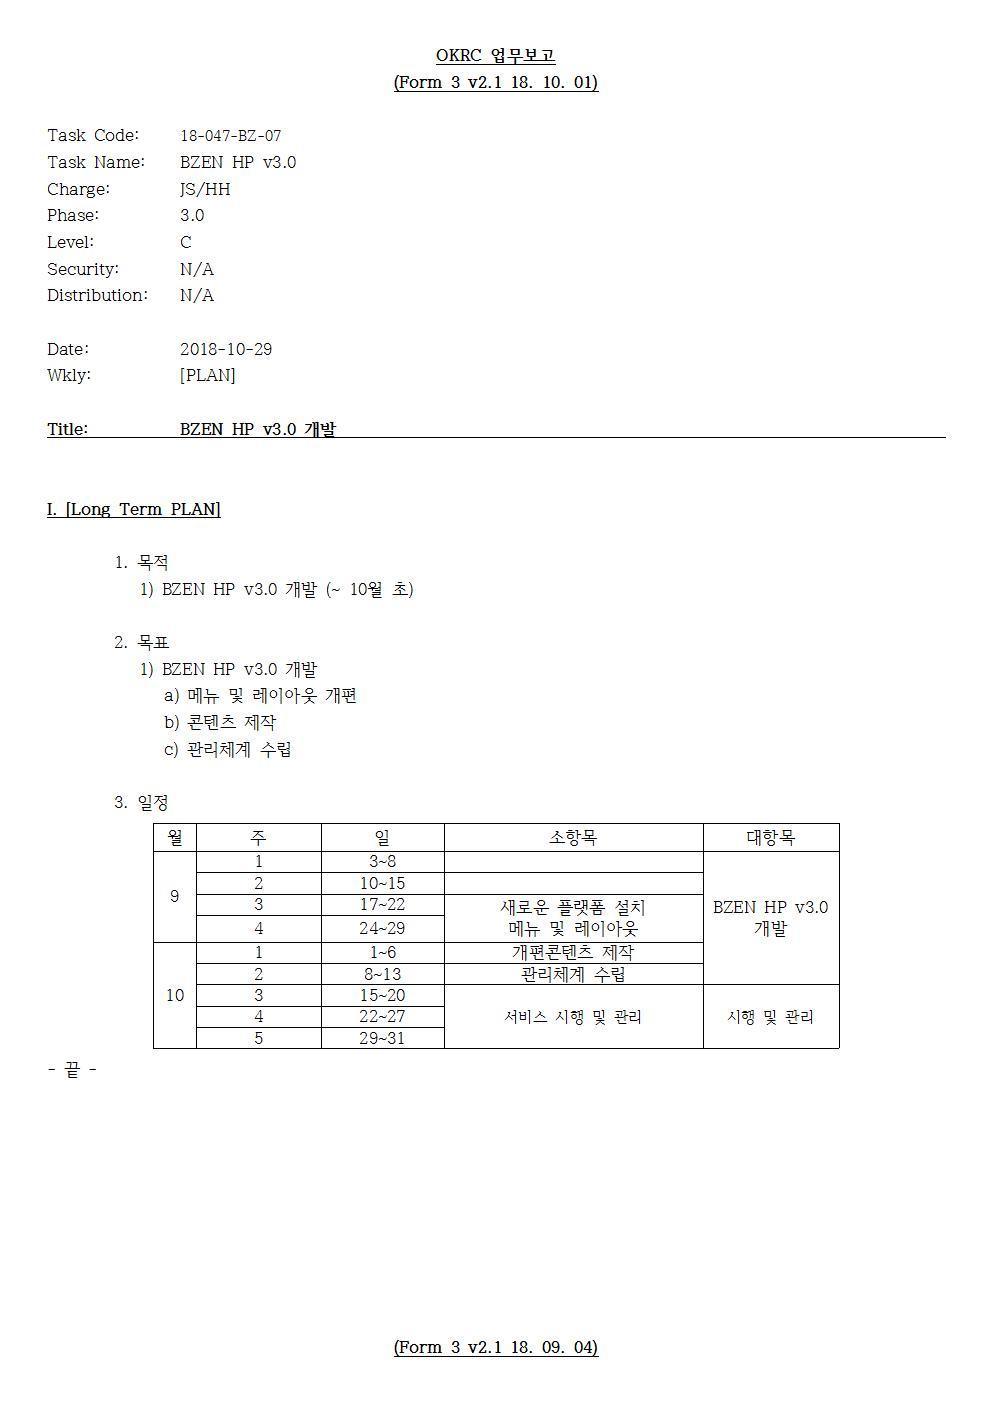 D-[18-047-BZ-07]-[BZEN HP v3.0]-[2018-10-29][HH]001.jpg